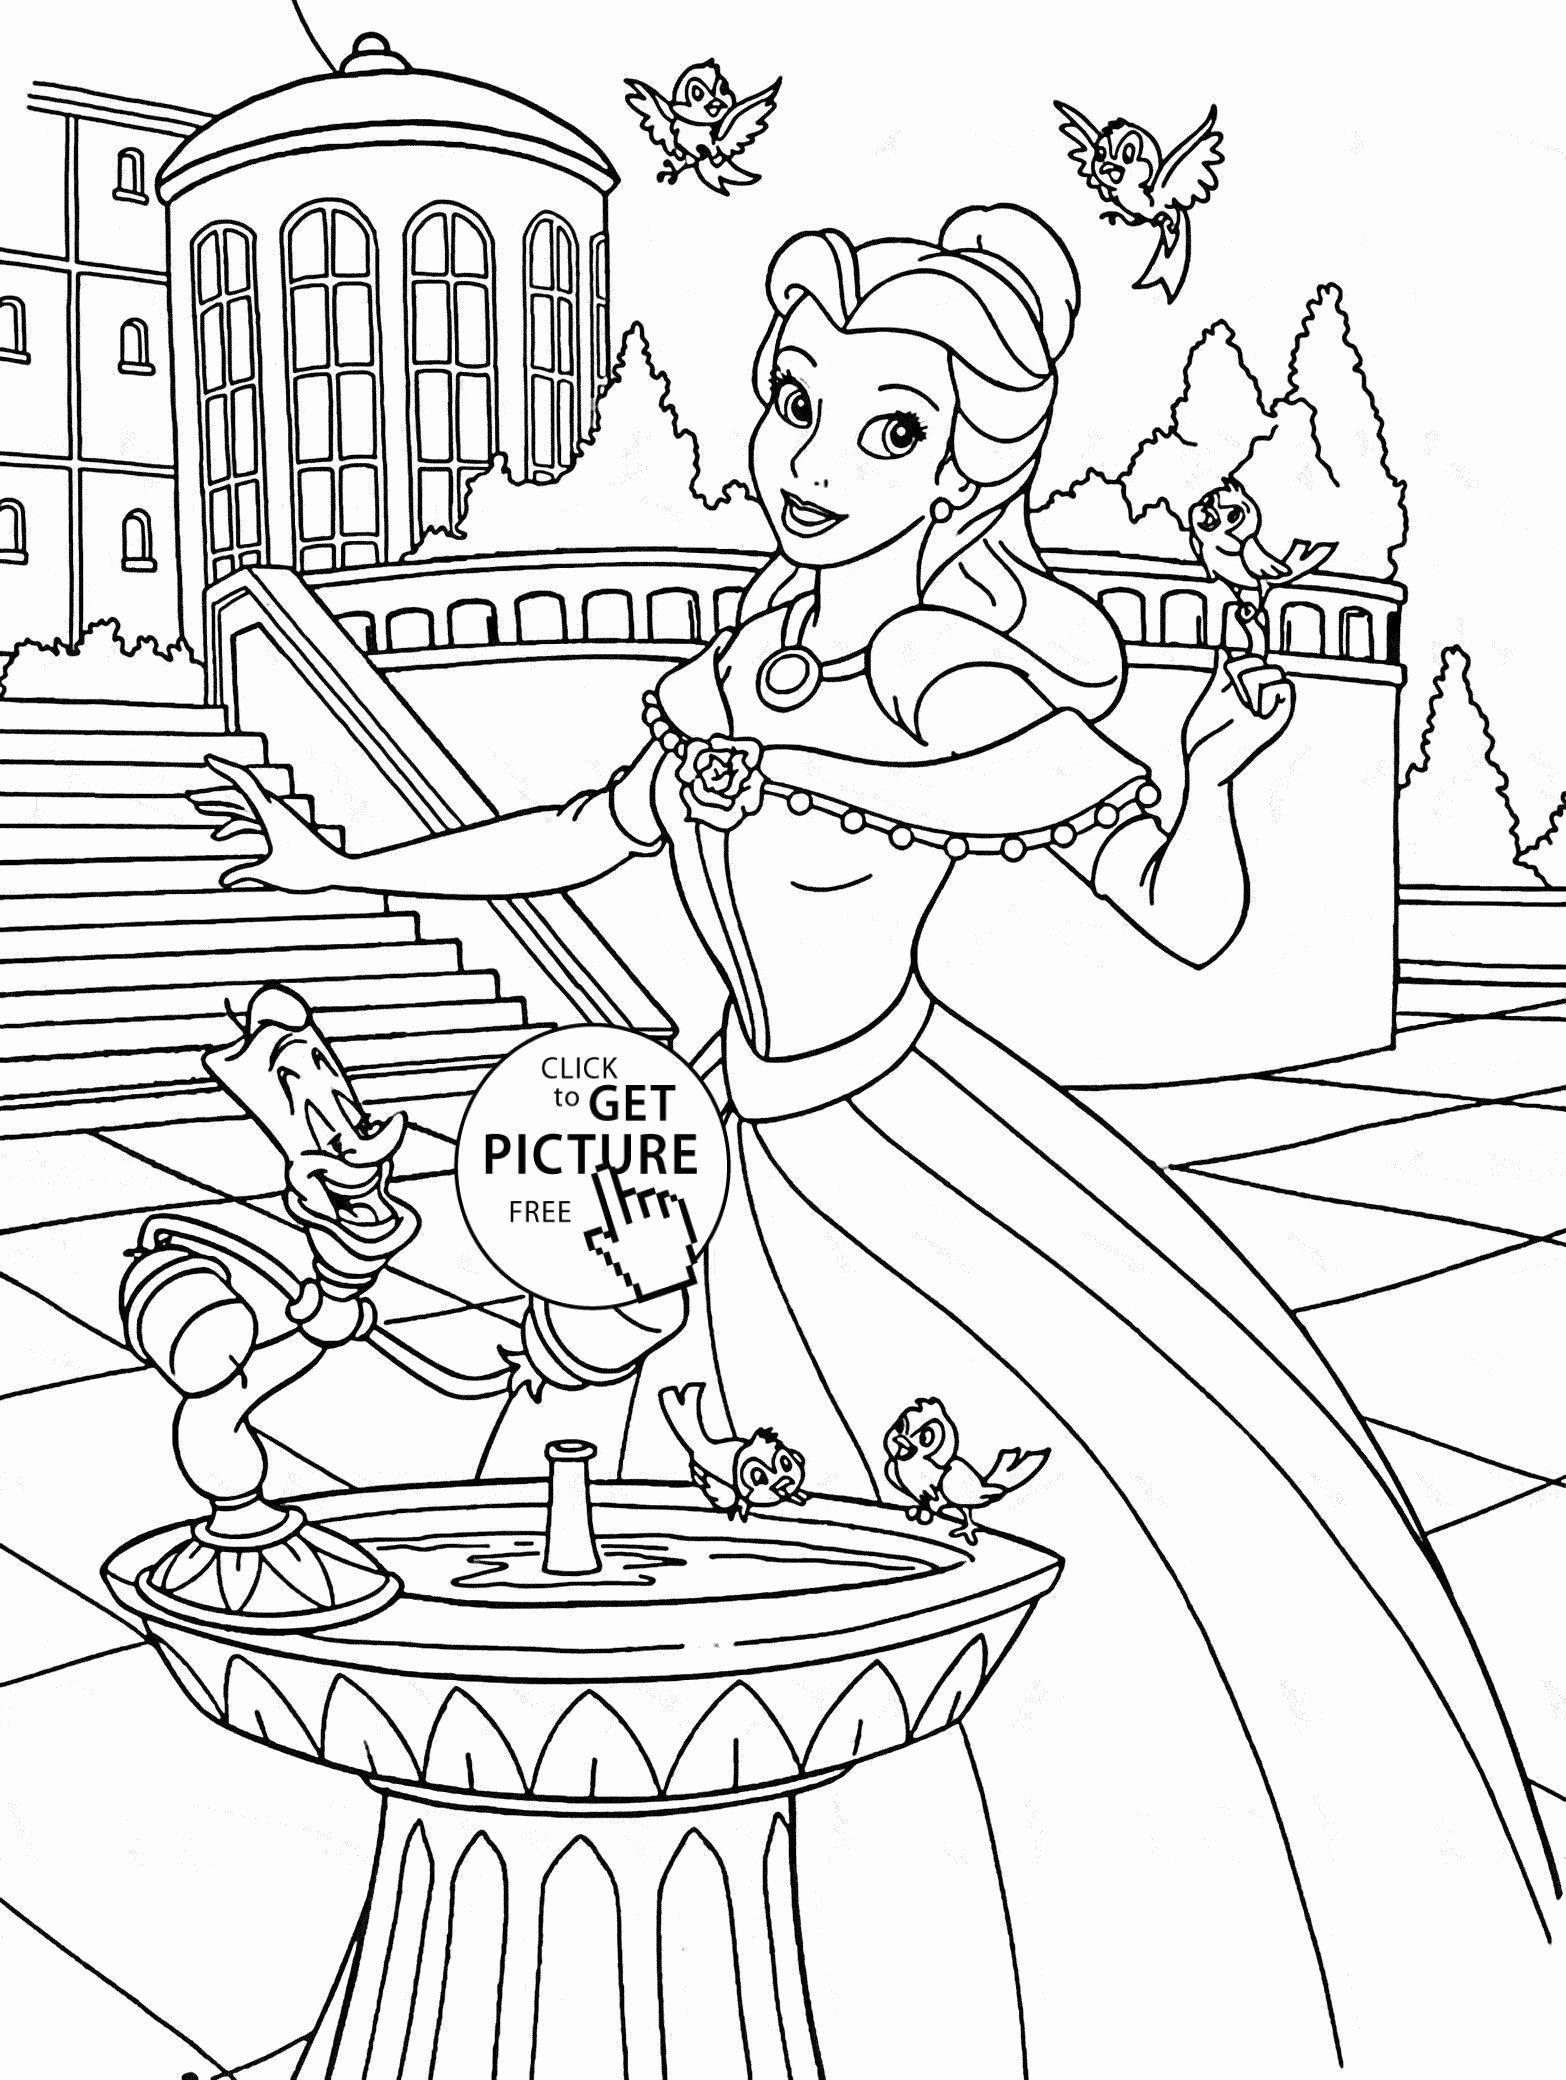 Disney Princesses Printable Coloring Pages Disney